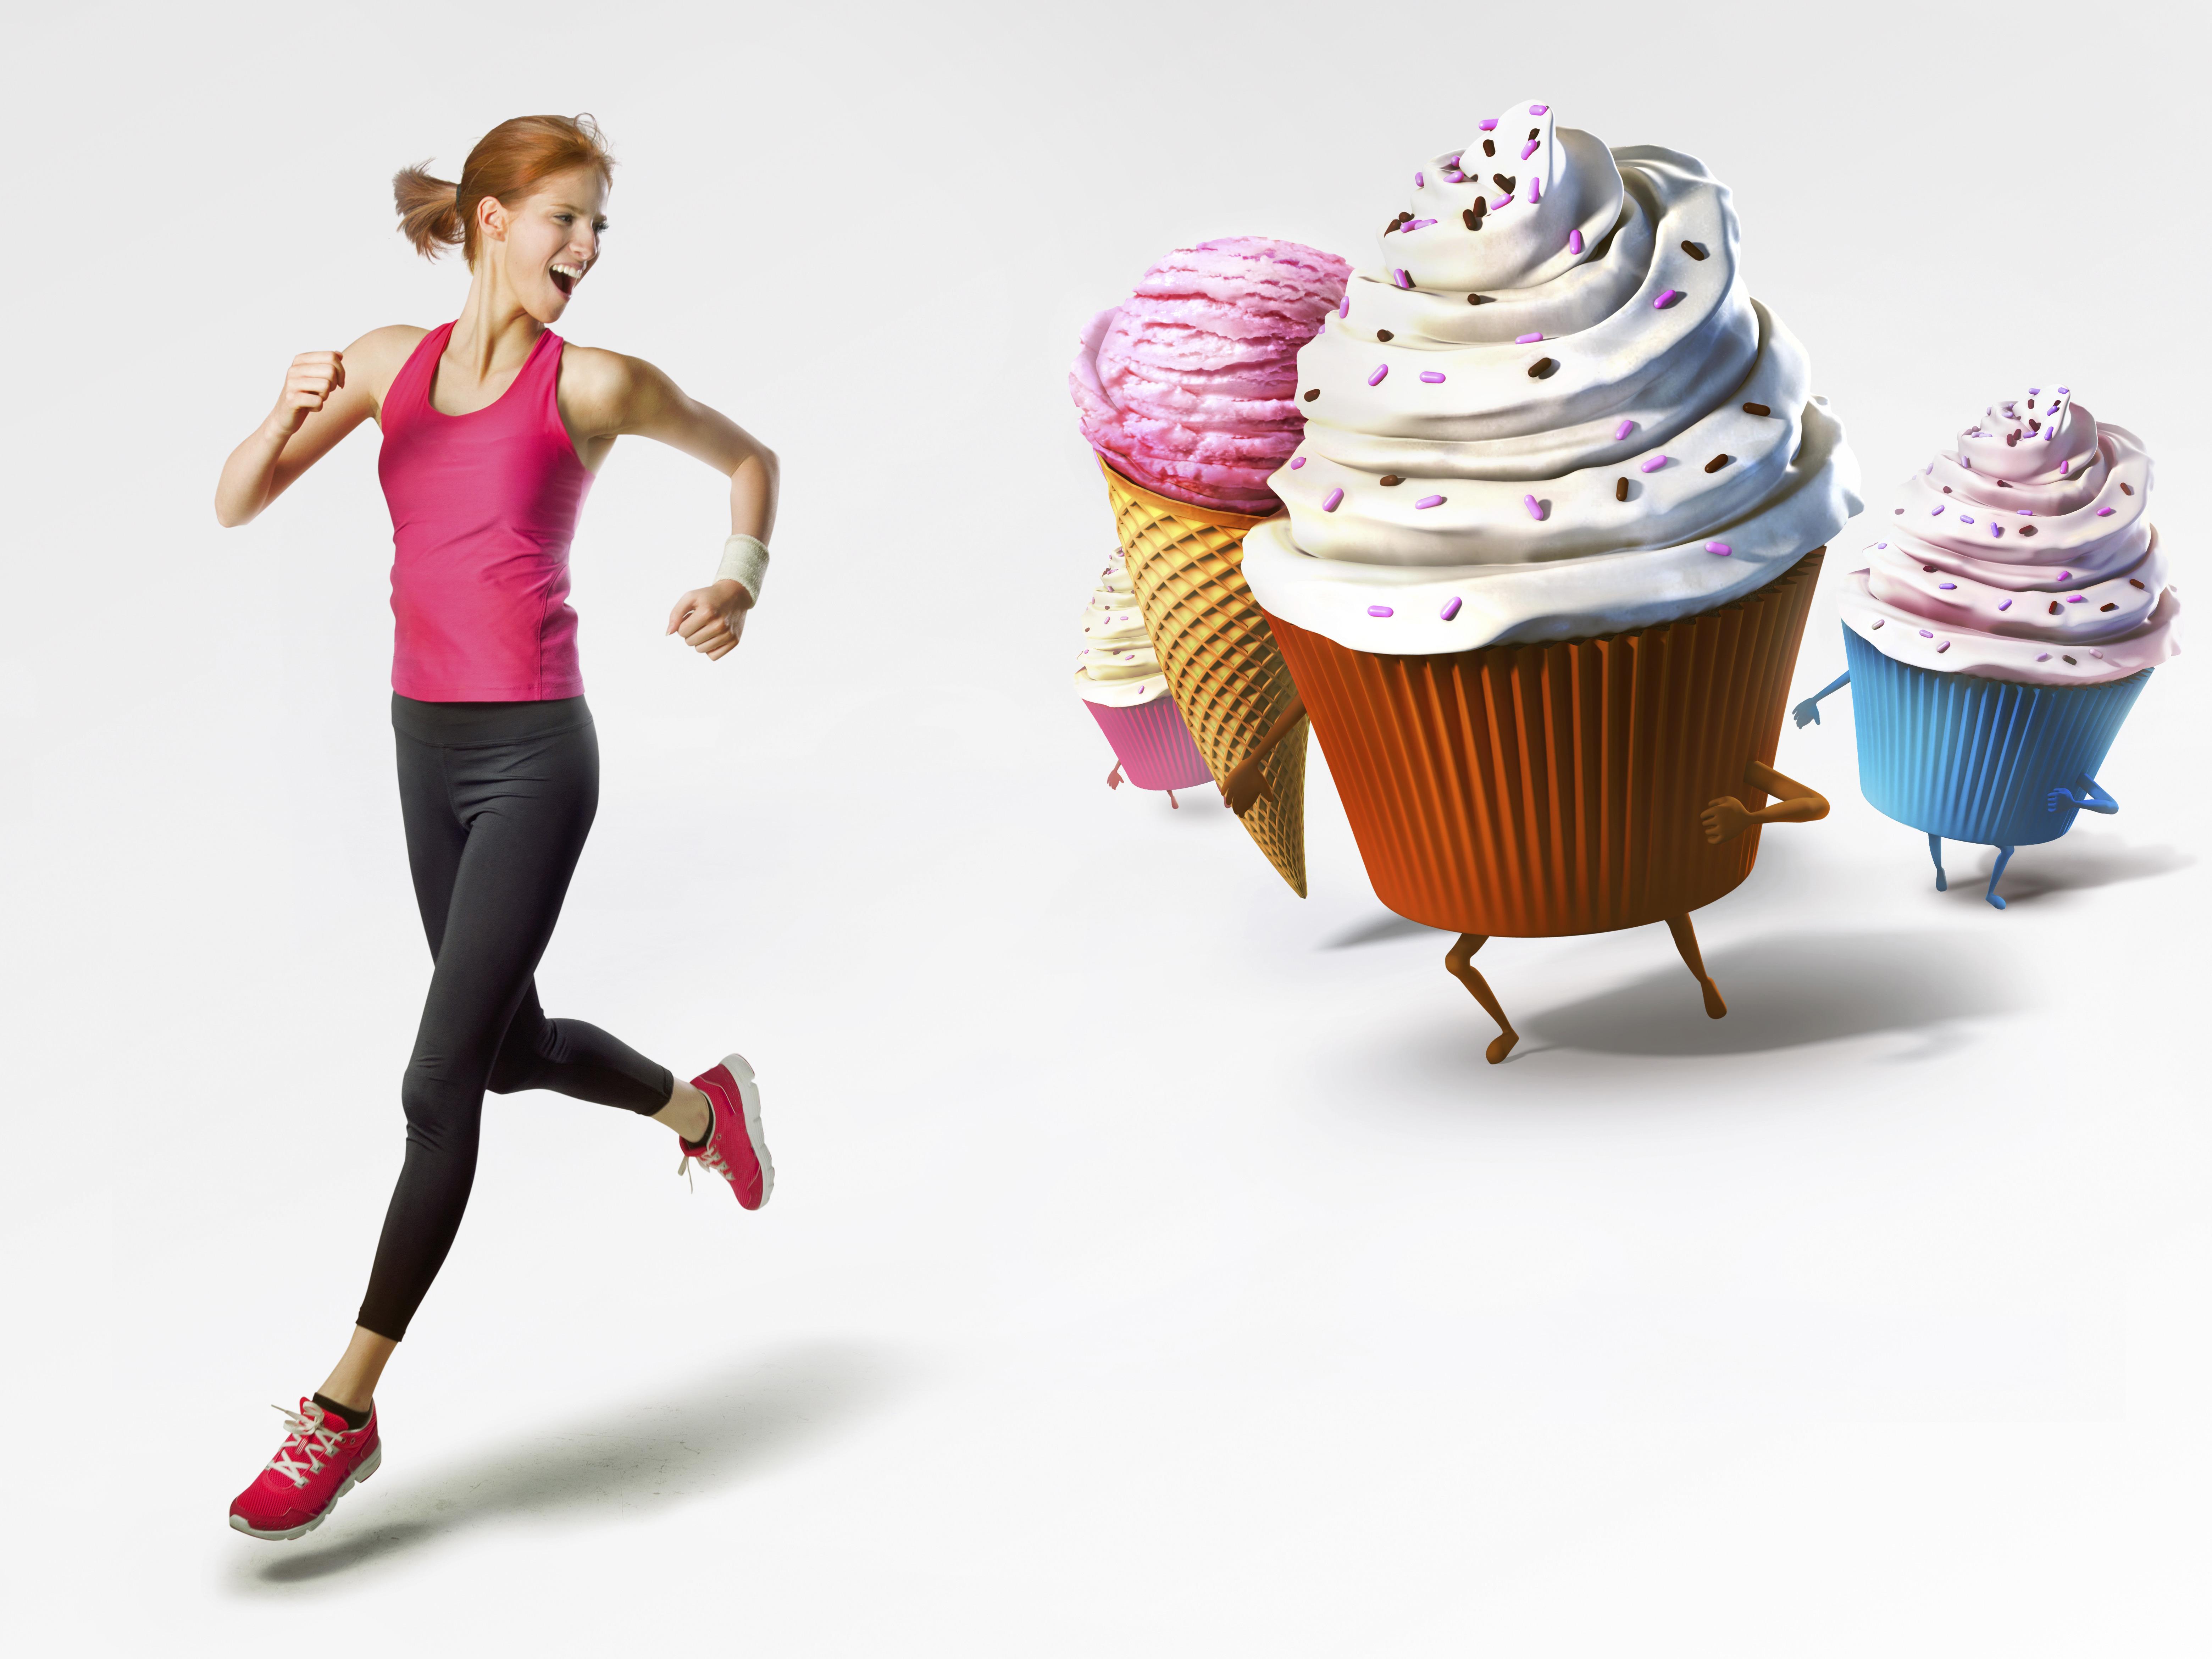 Alimentaci n para controlar la diabetes youfit las rozas - Alimentos para controlar la diabetes ...